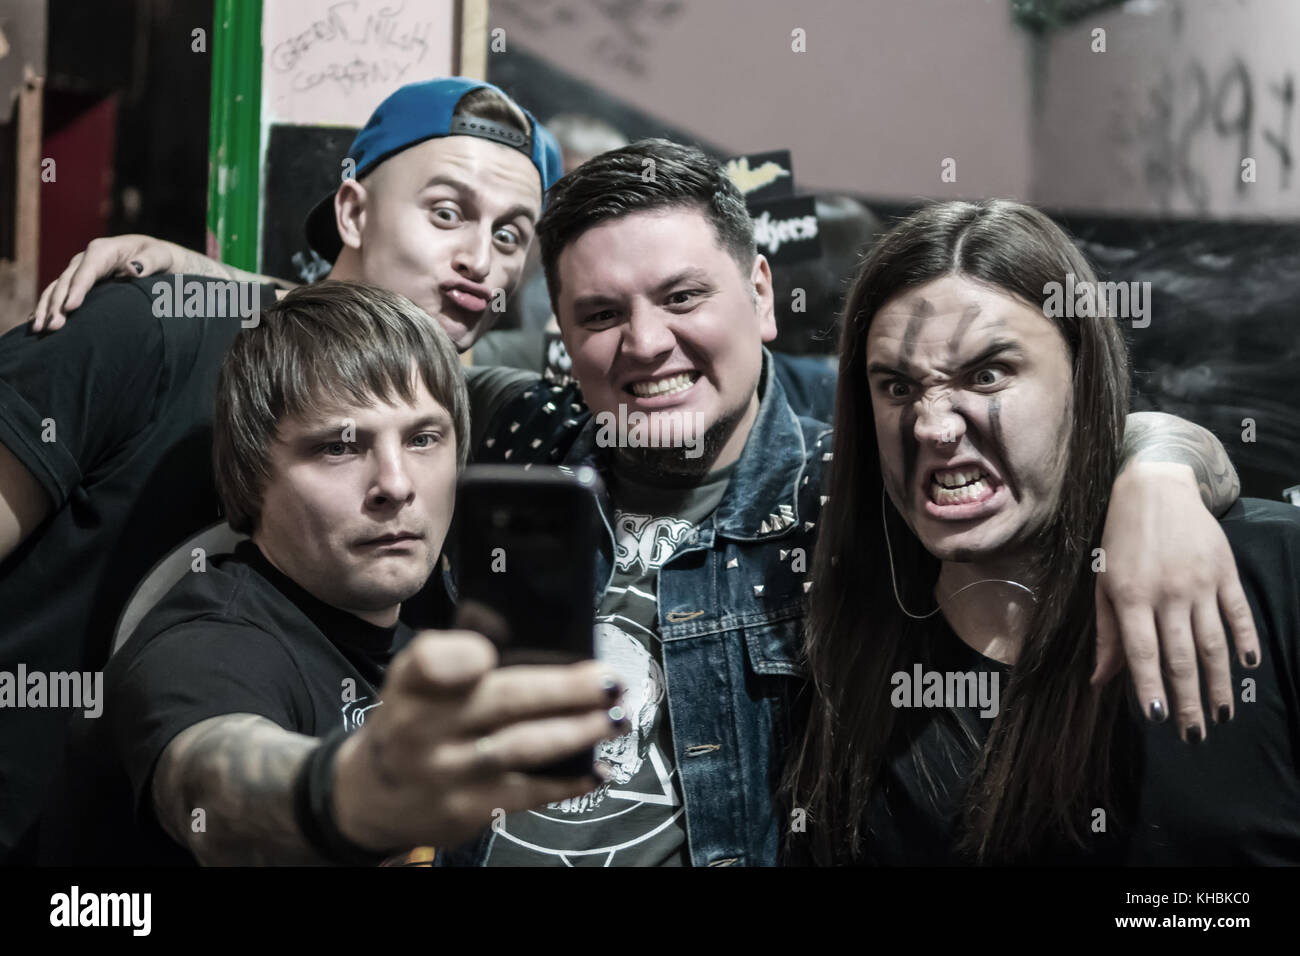 Group of men do selfie in a dark room, grimacing before the camera - Stock Image